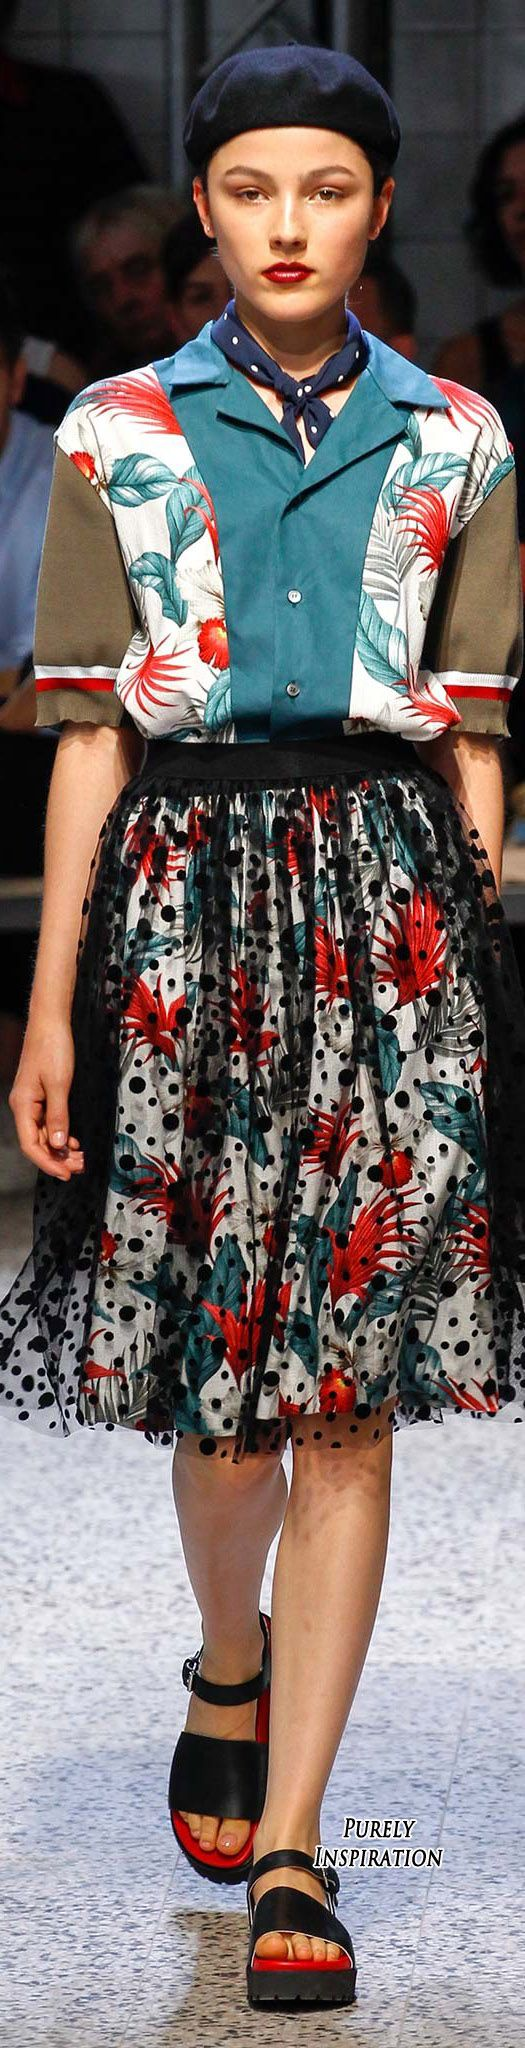 Antonio Marras SS2016 Women's Fashion RTW | Purely Inspiration